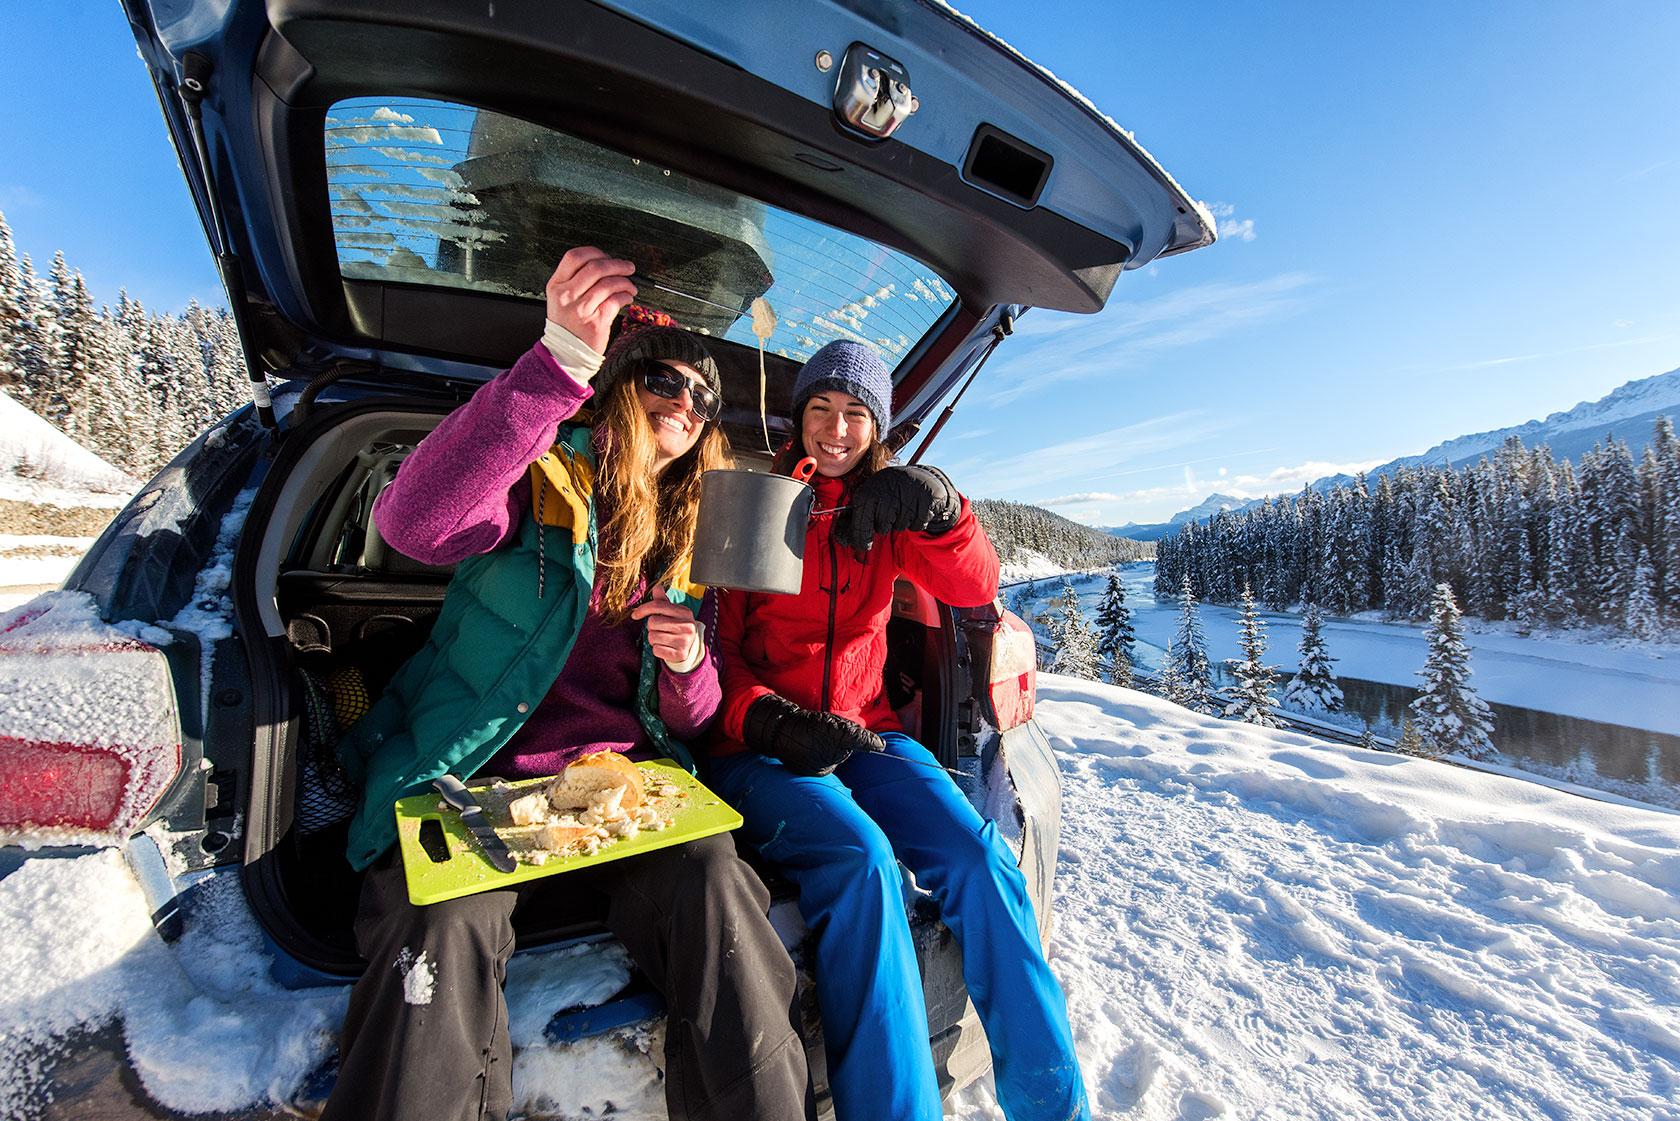 austin-trigg-patagonia-banff-alberta-winter-canada-trip-adventure-outside-snow-forest-morants-curve-fondue-roadside-cooking-eating-car-lifestyle.jpg